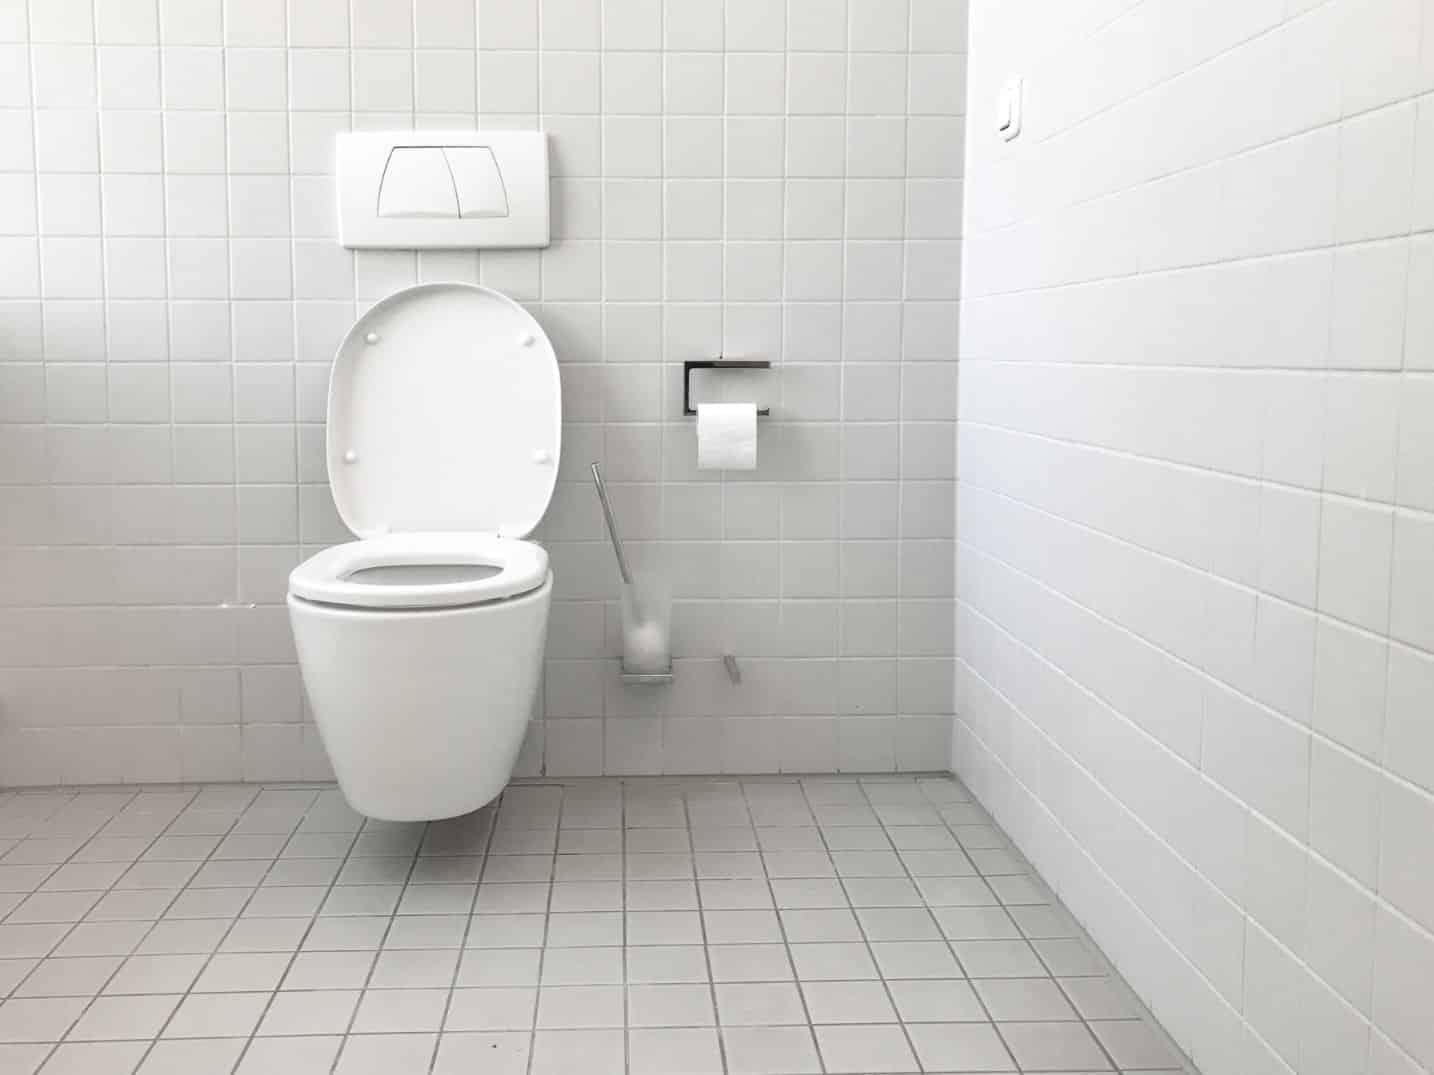 Toilet Care Plumbing